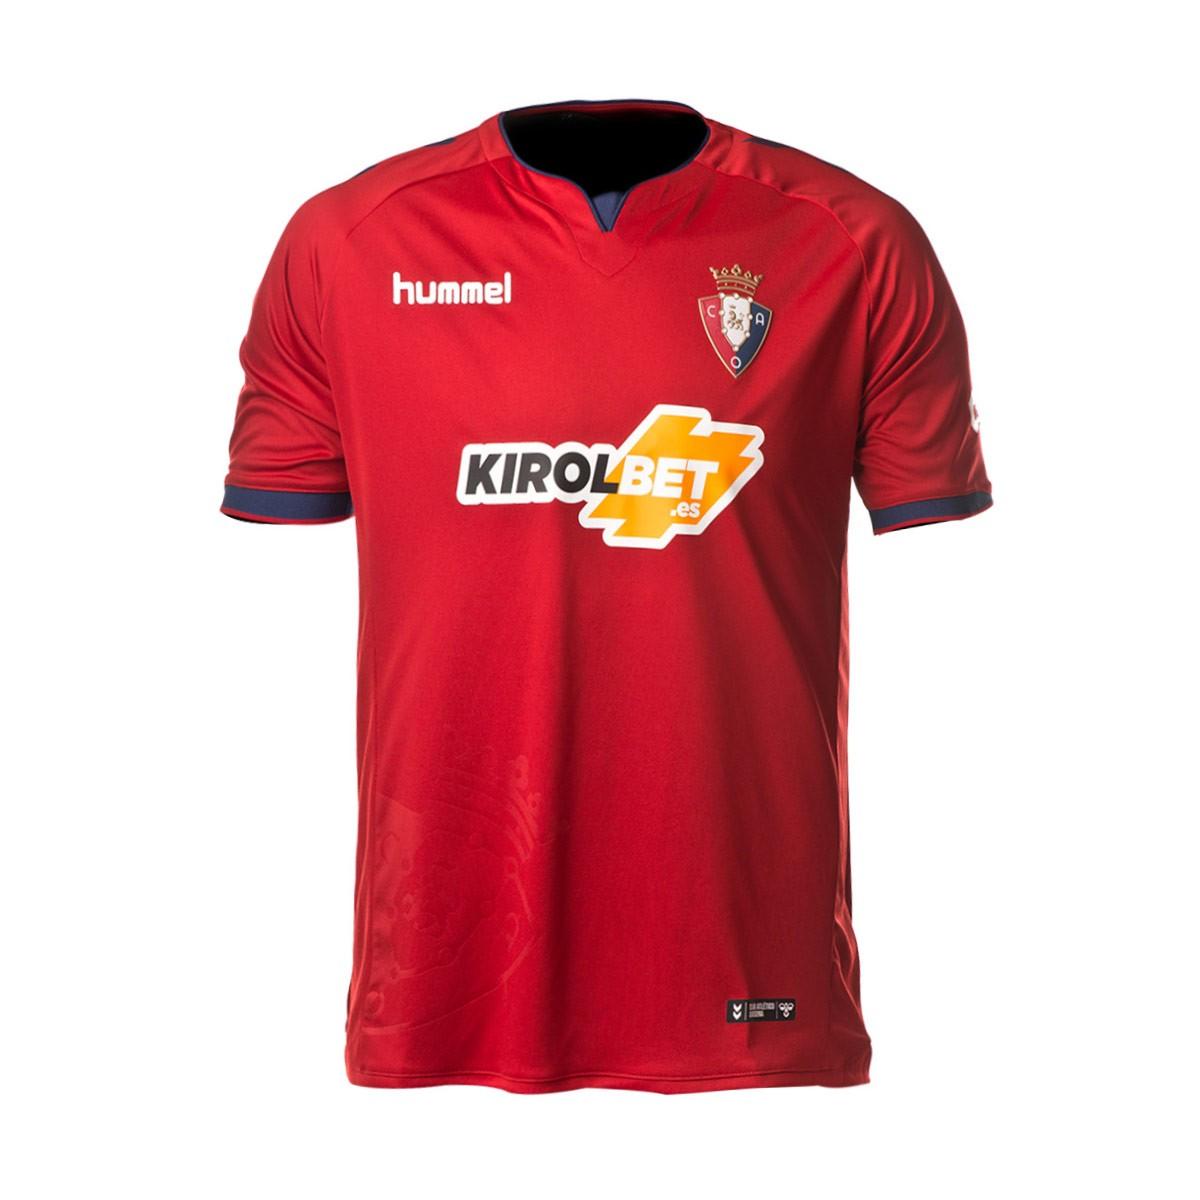 676afd0d513 Jersey Hummel CA Osasuna 2018-2019 Home Red-Marine - Football store ...